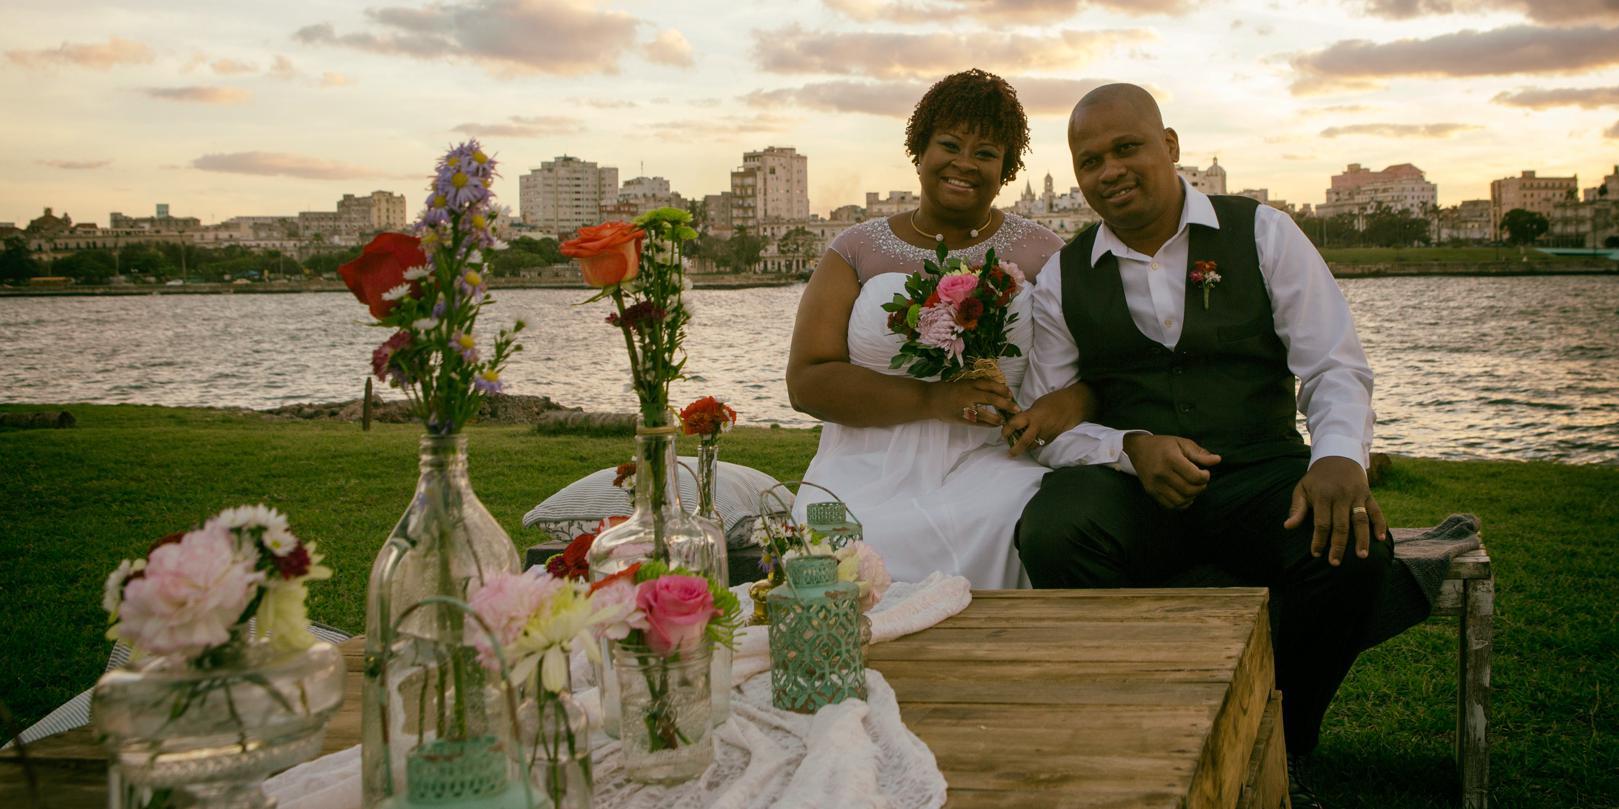 bodas-sin-clasificar-sin-tema-cuba-42131.jpg